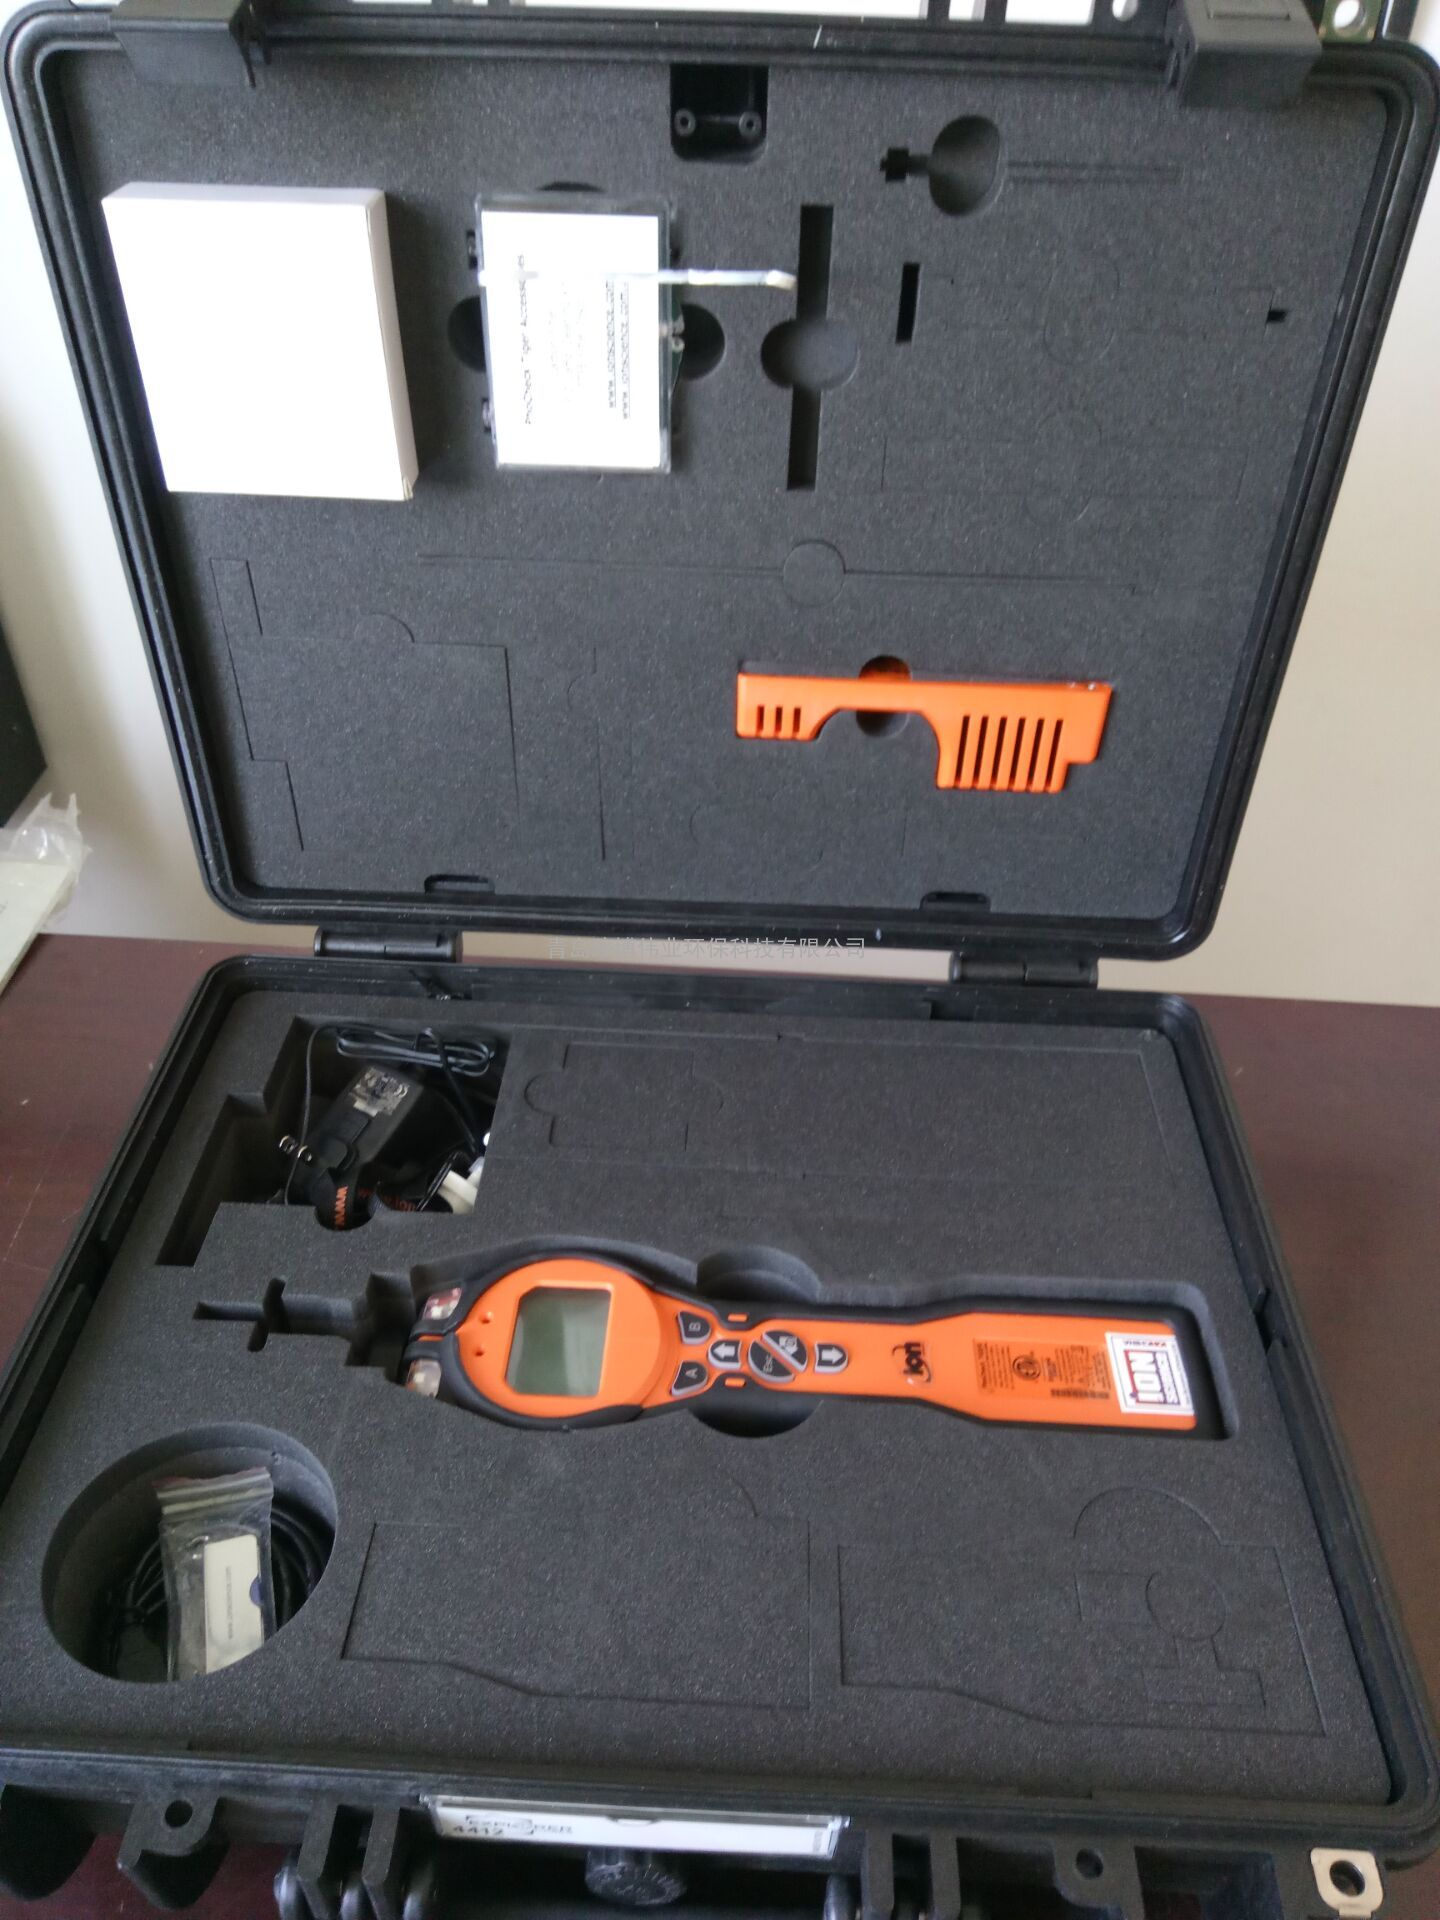 PCT-LB-00 VOC检测仪的技术参数以及标准配置